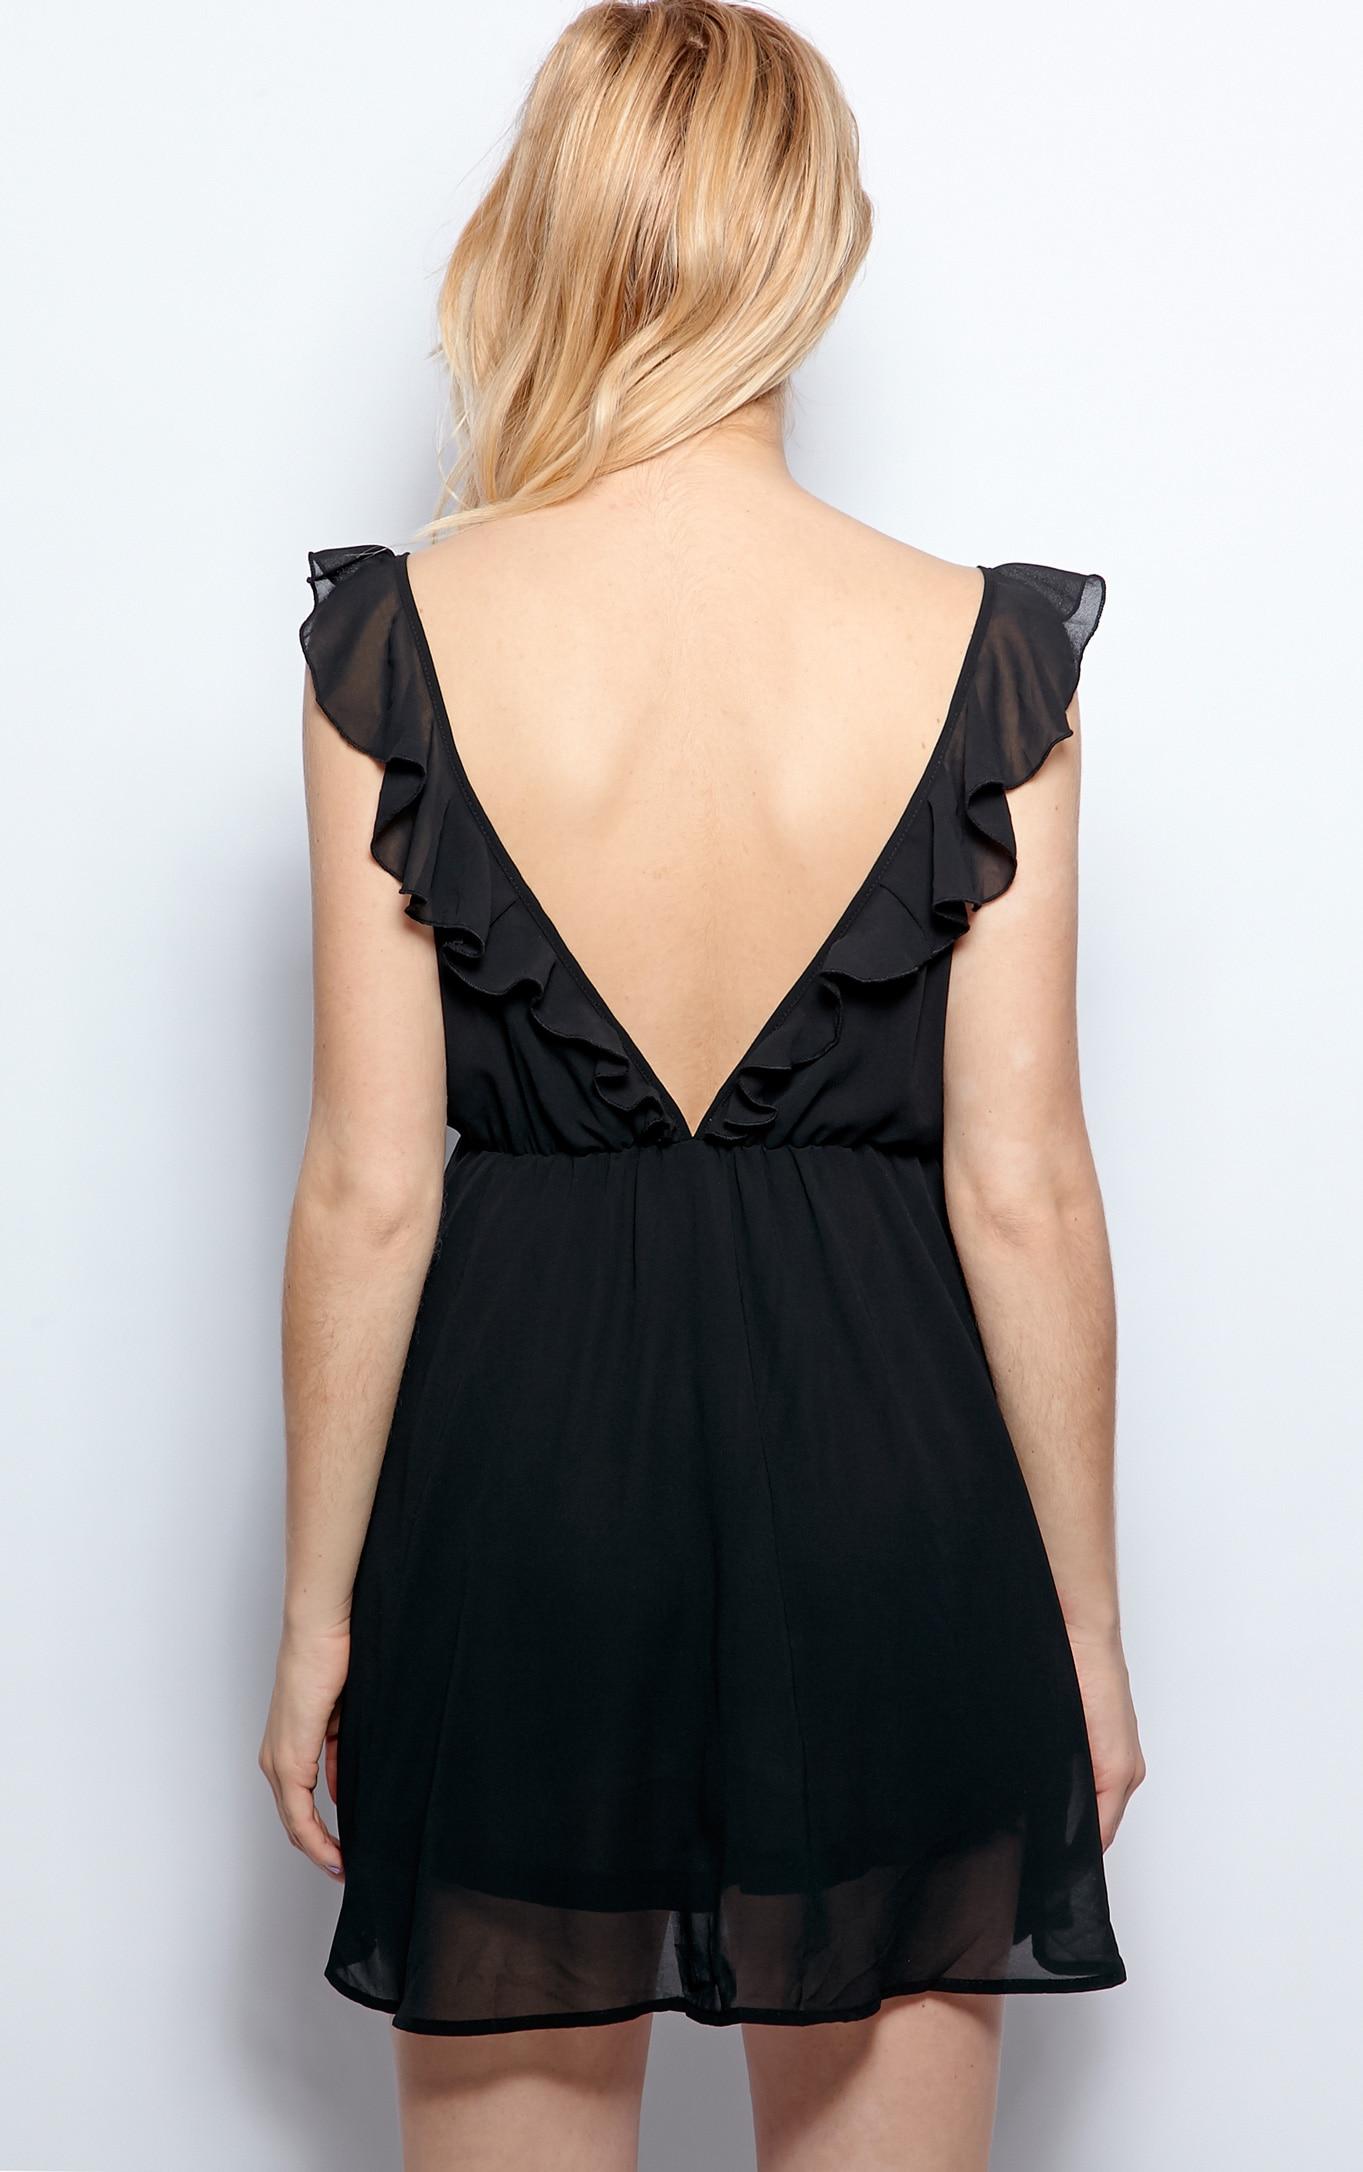 Corinne Black Chiffon Babydoll Dress 2